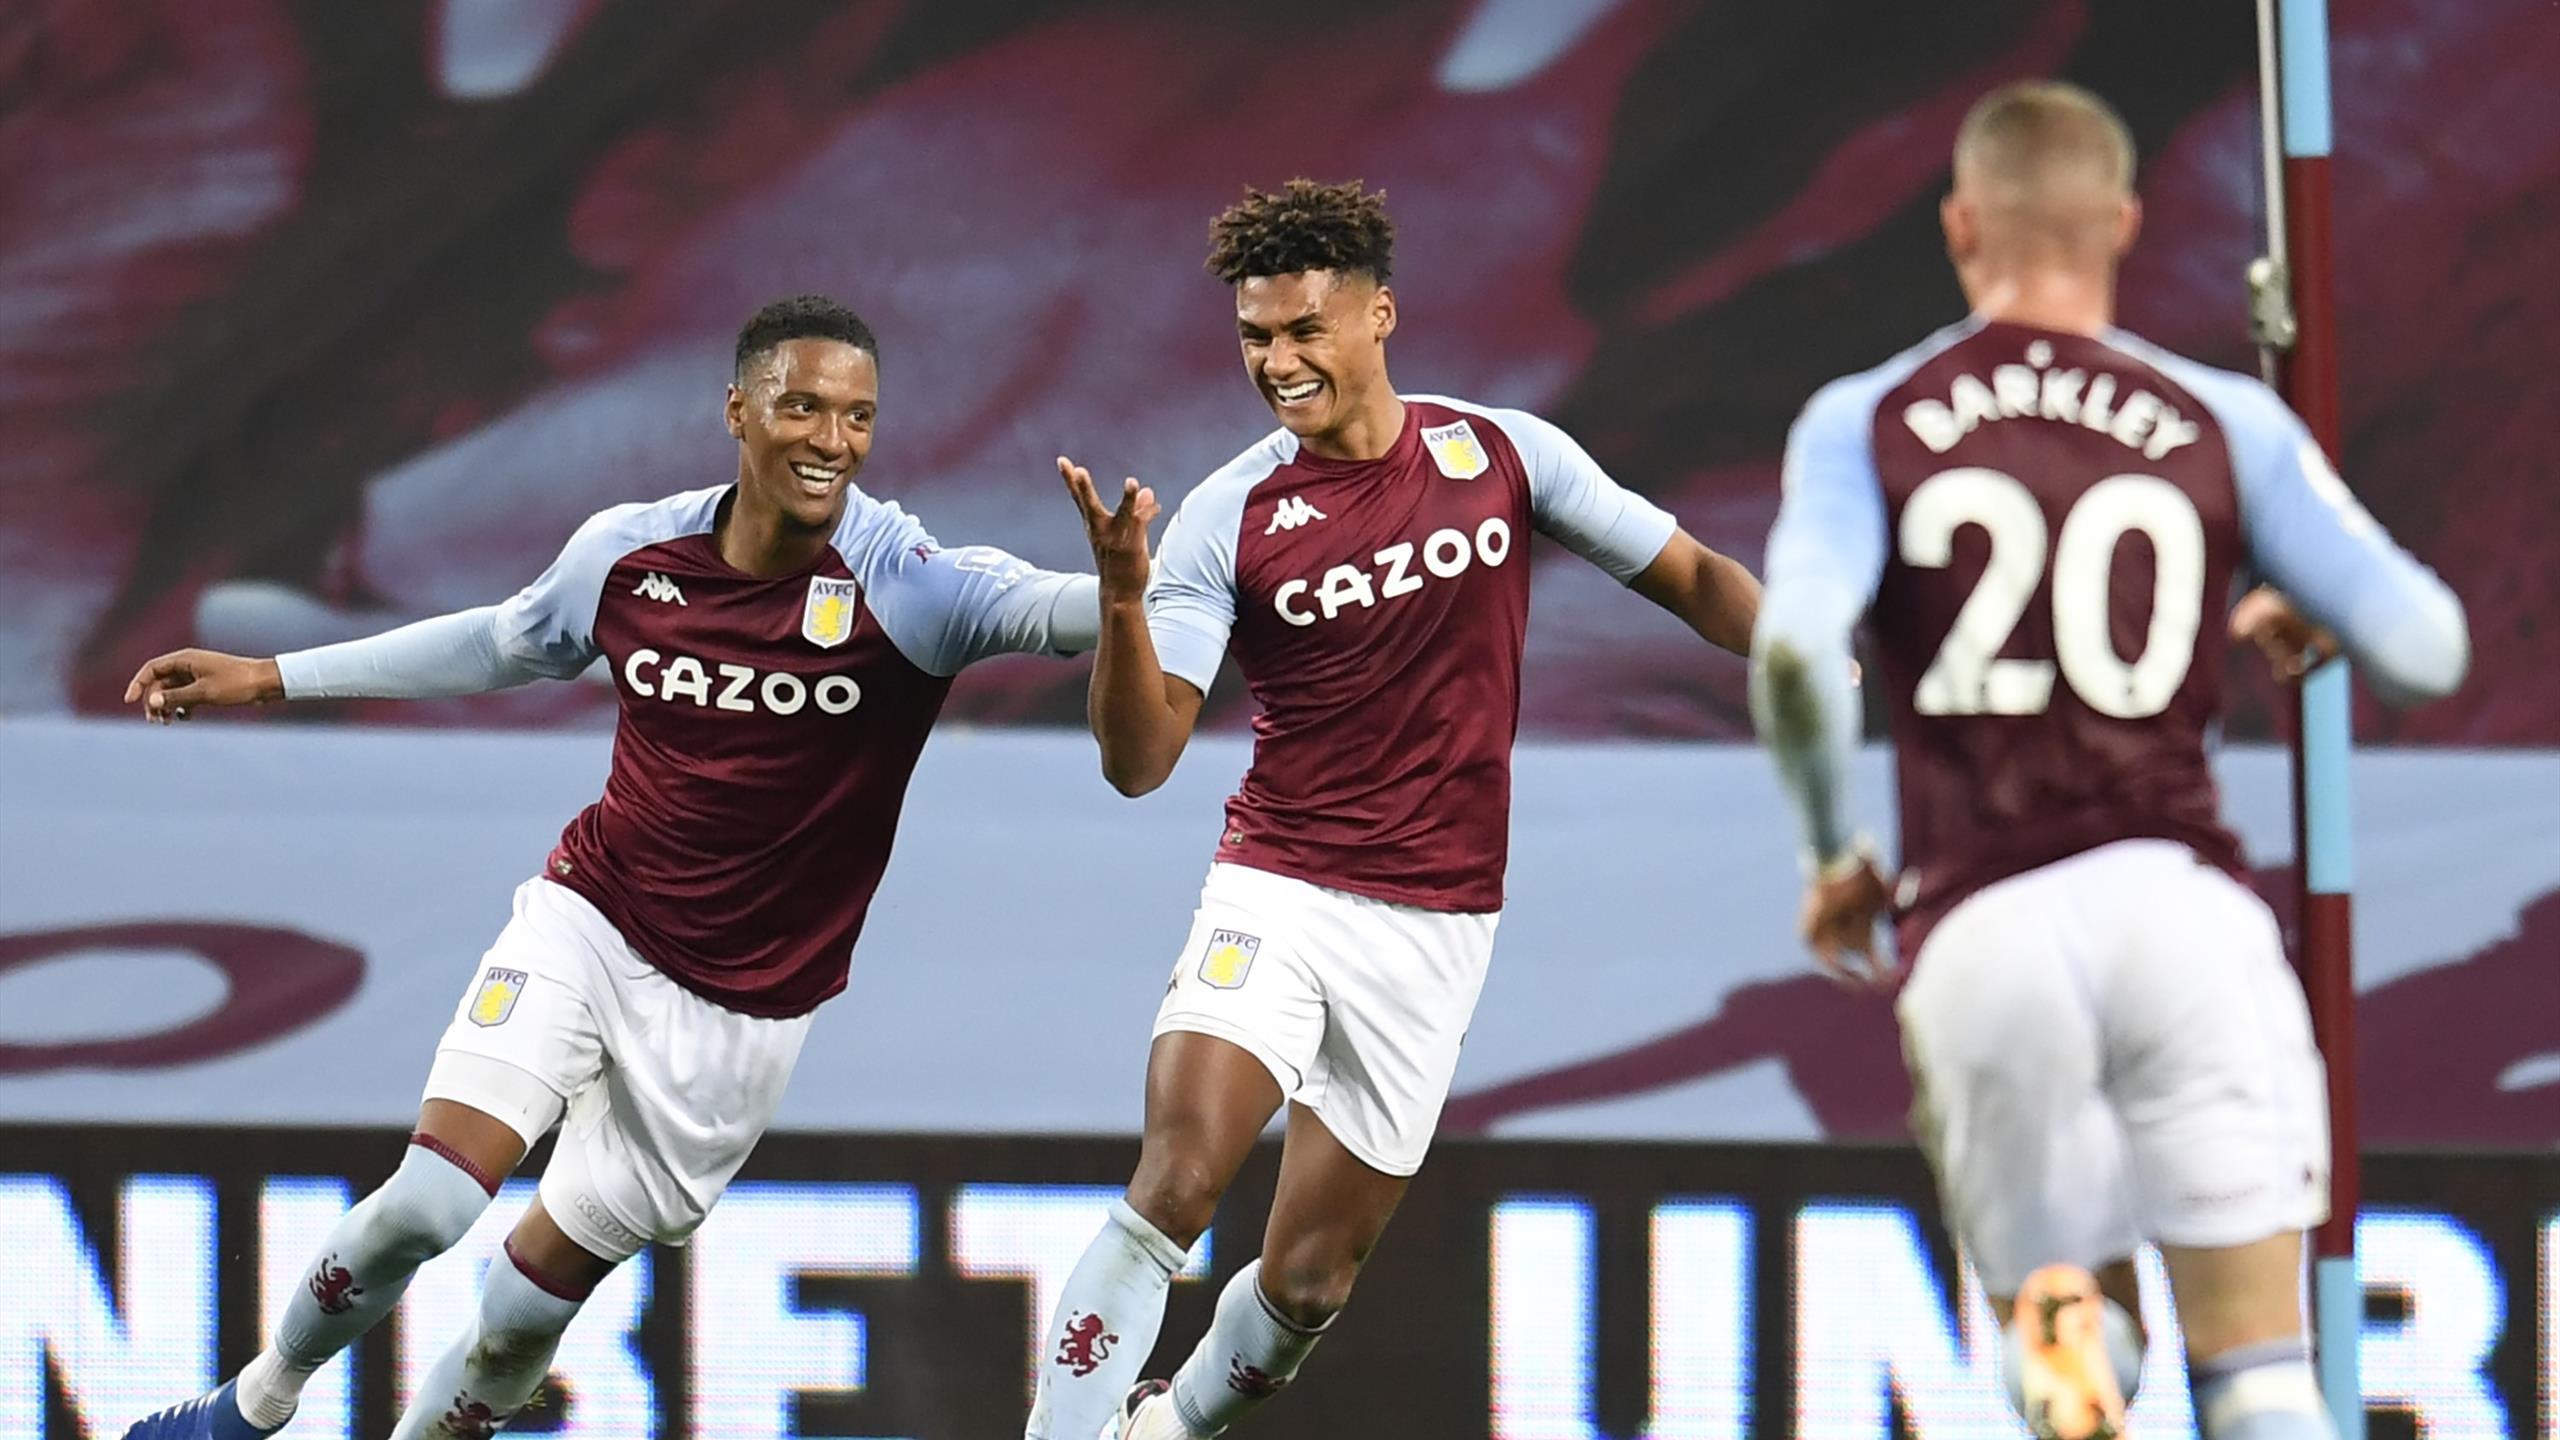 Aston Villa Score Seven To Rout Liverpool In Astonishing Performance Eurosport